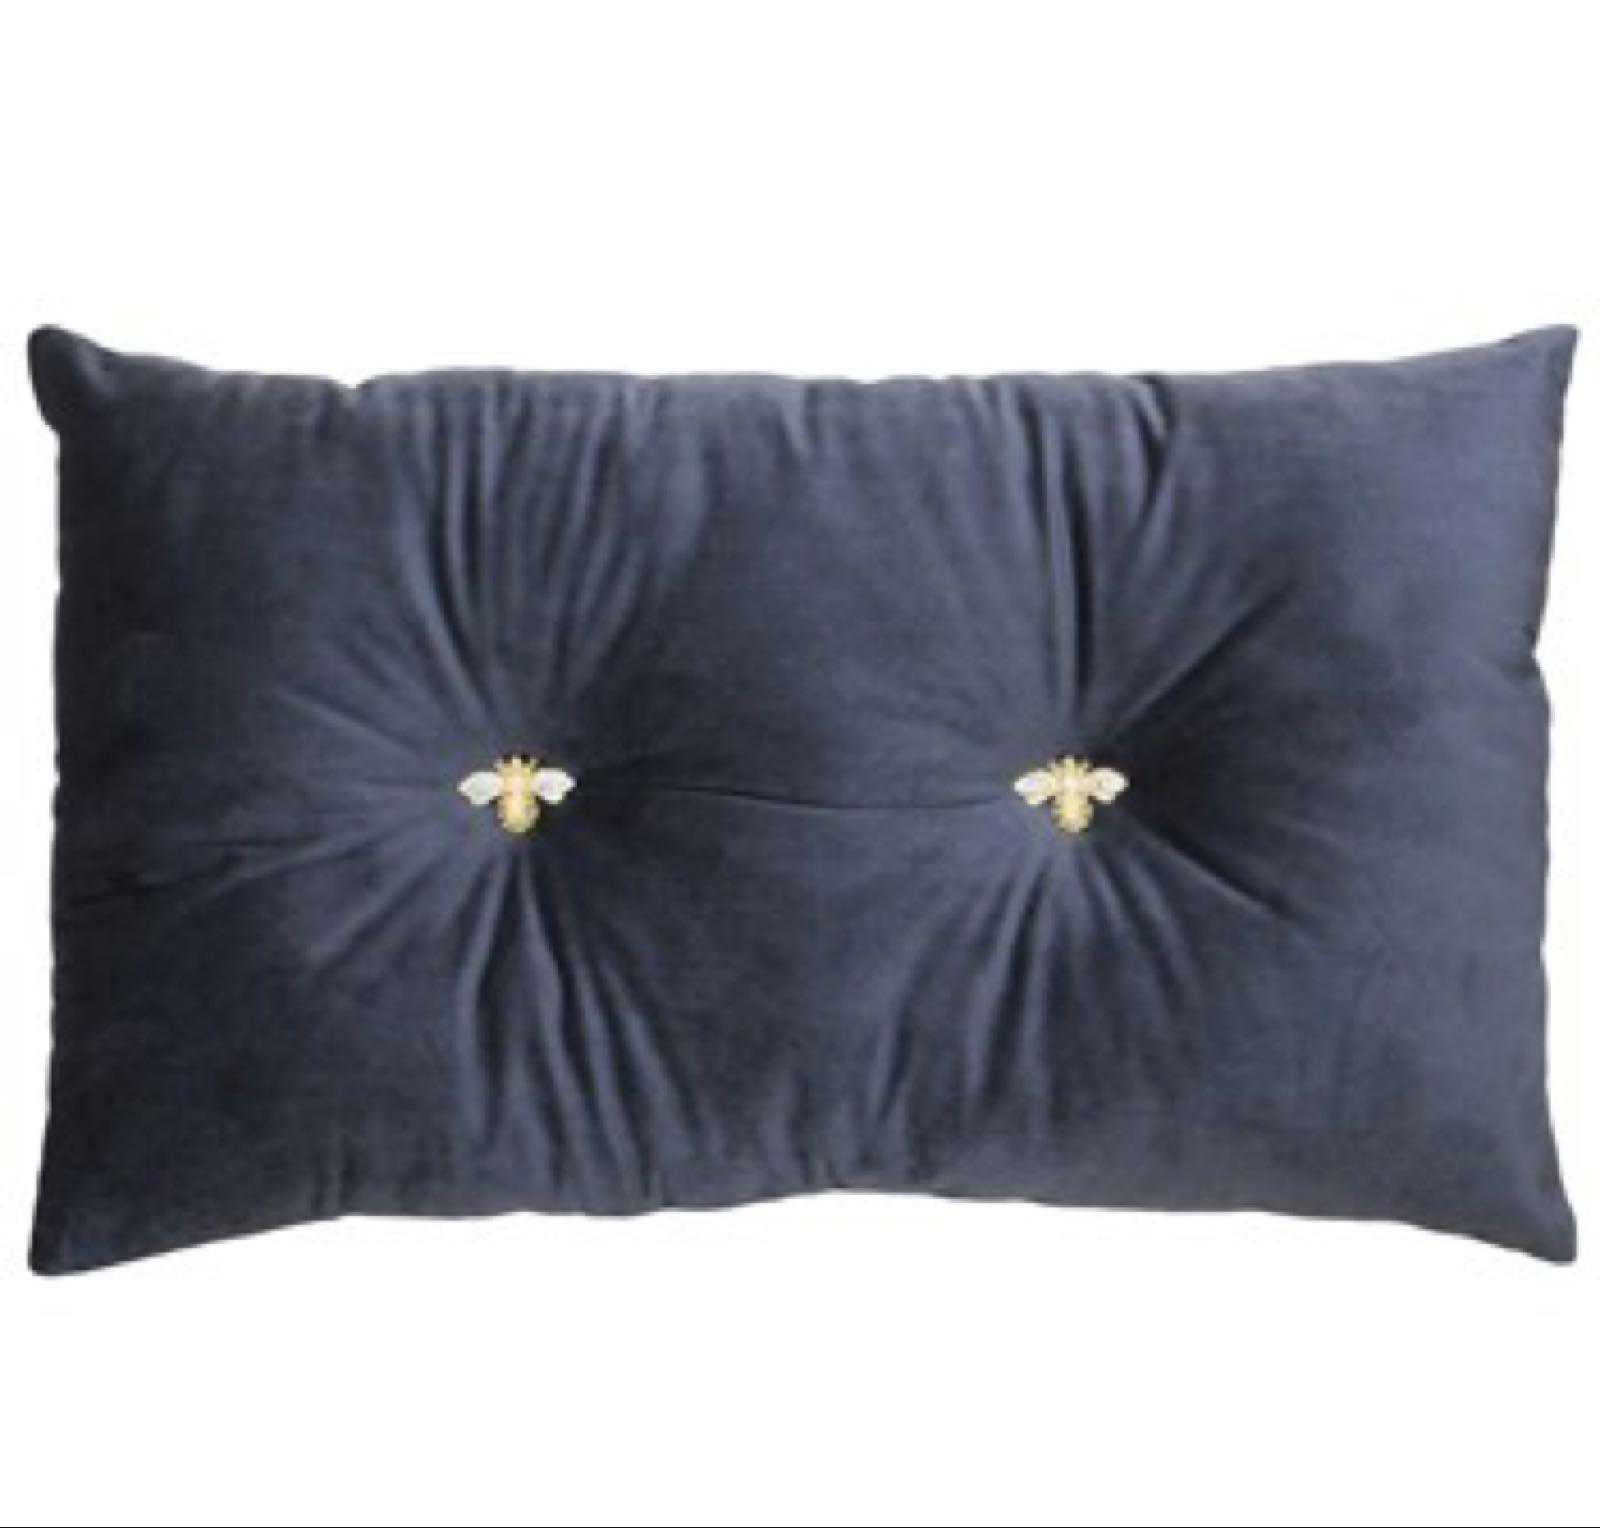 Charcoal Bumble Bee Cushion 47cm x30cm